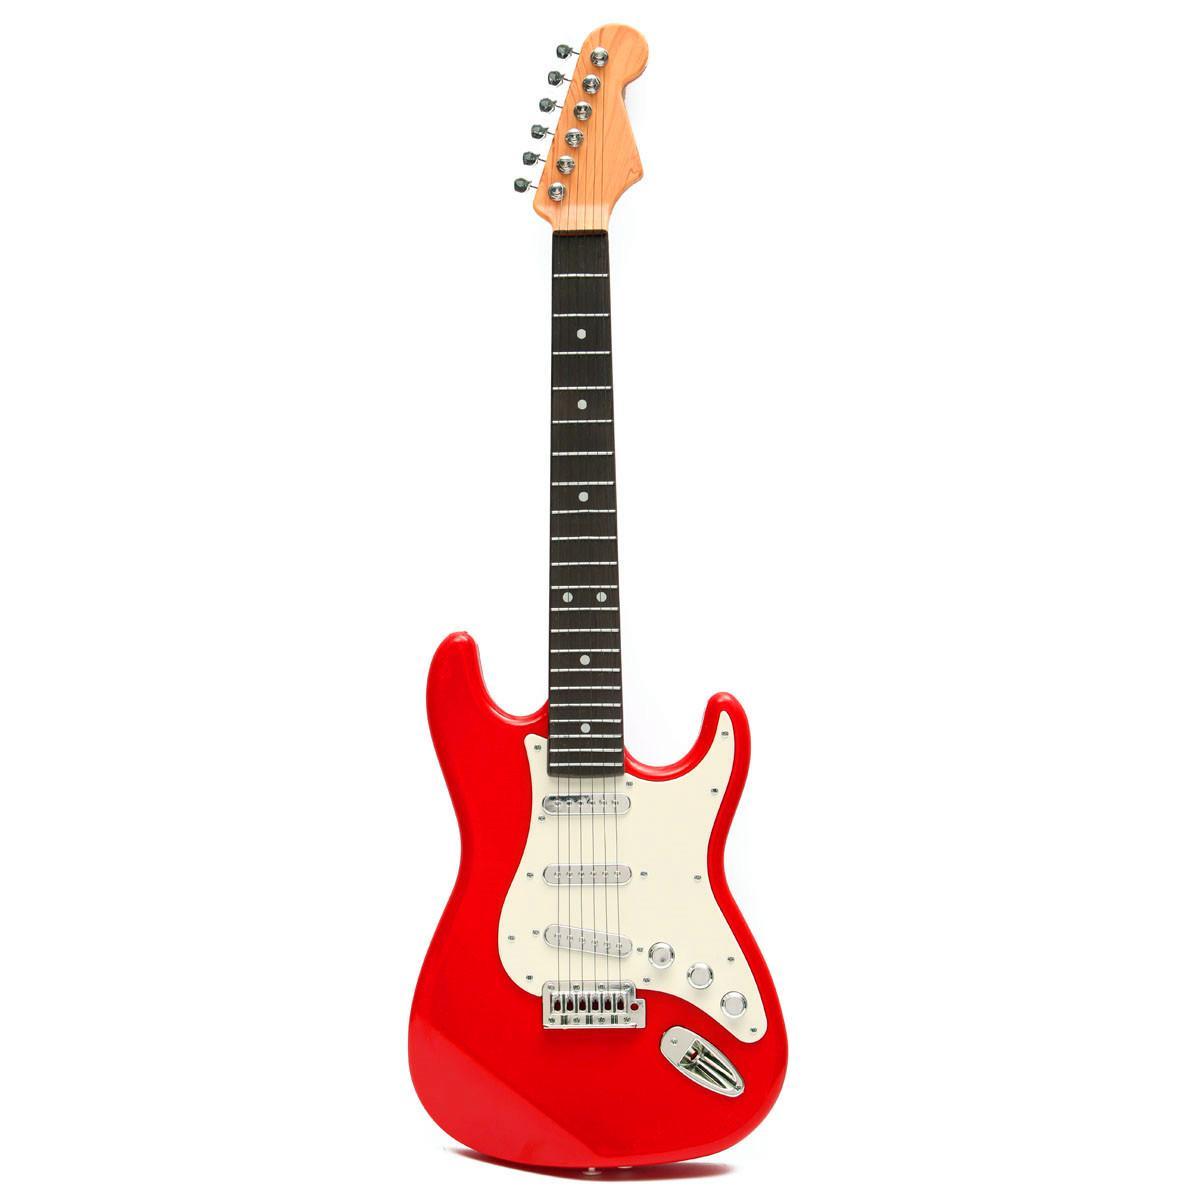 wholesale best price children 39 s simulation electric guitar 6 strings best for kids musical toys. Black Bedroom Furniture Sets. Home Design Ideas